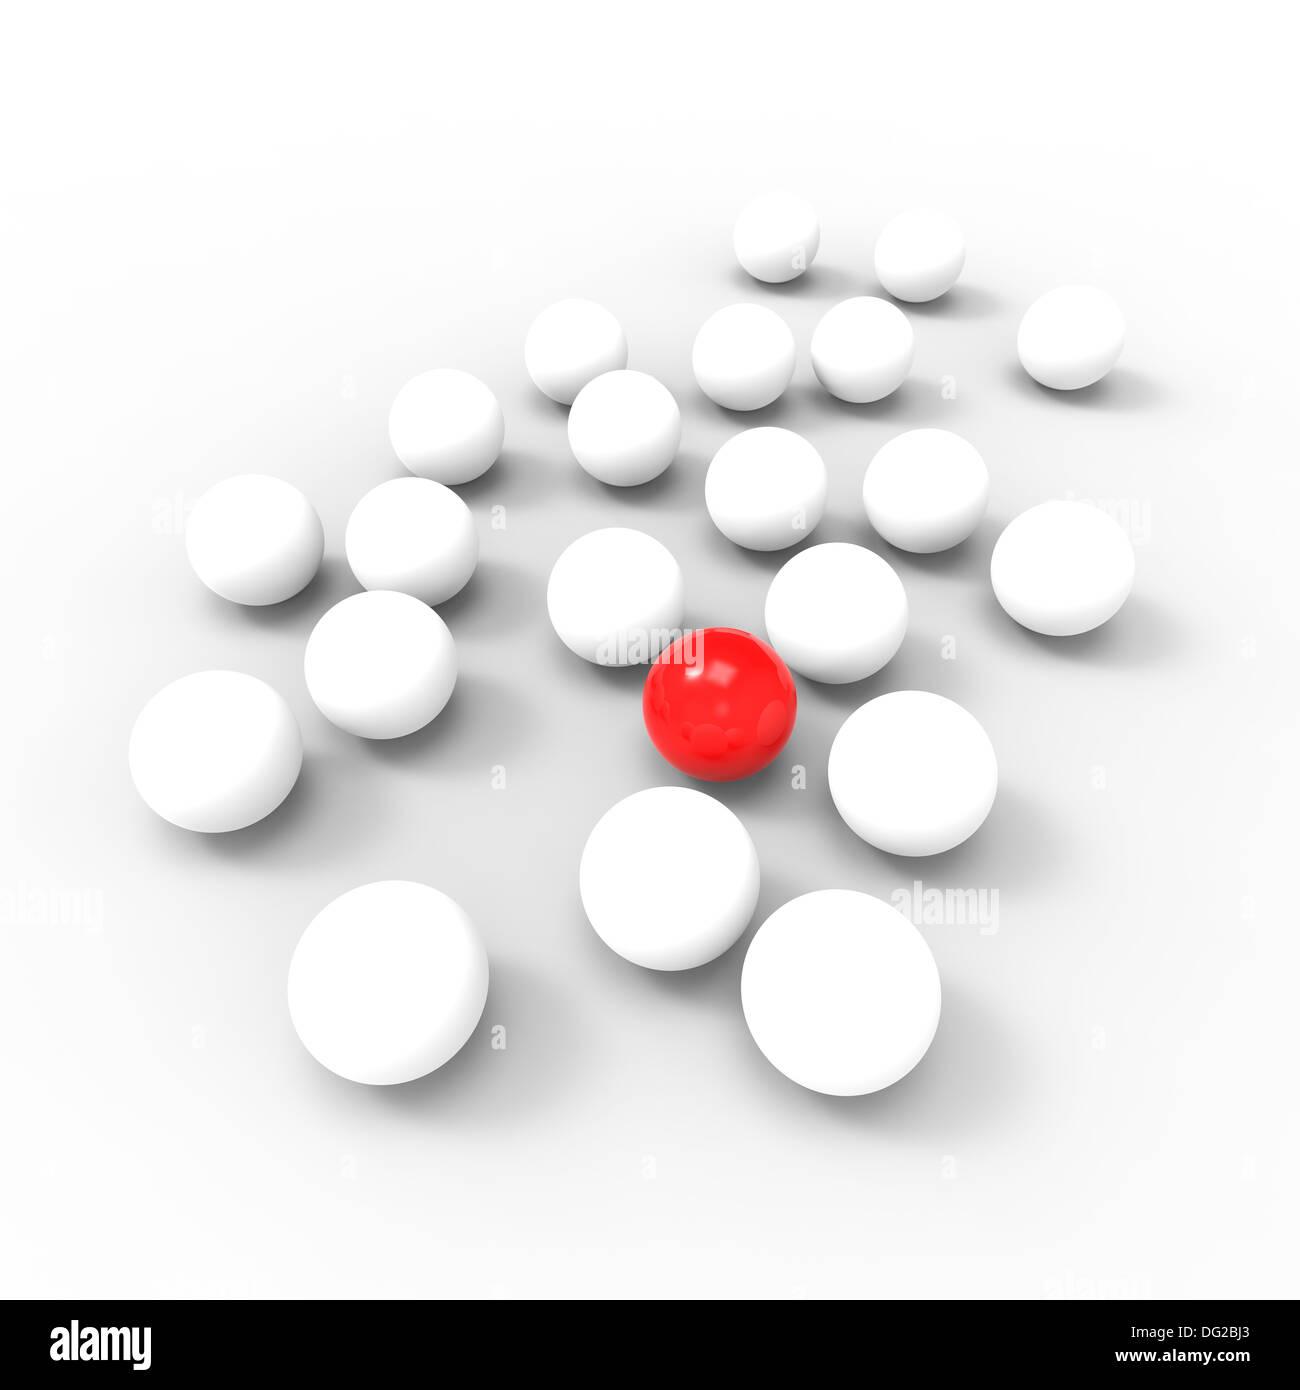 Concept for: stranger, spy, insider, leader, individual... - Stock Image